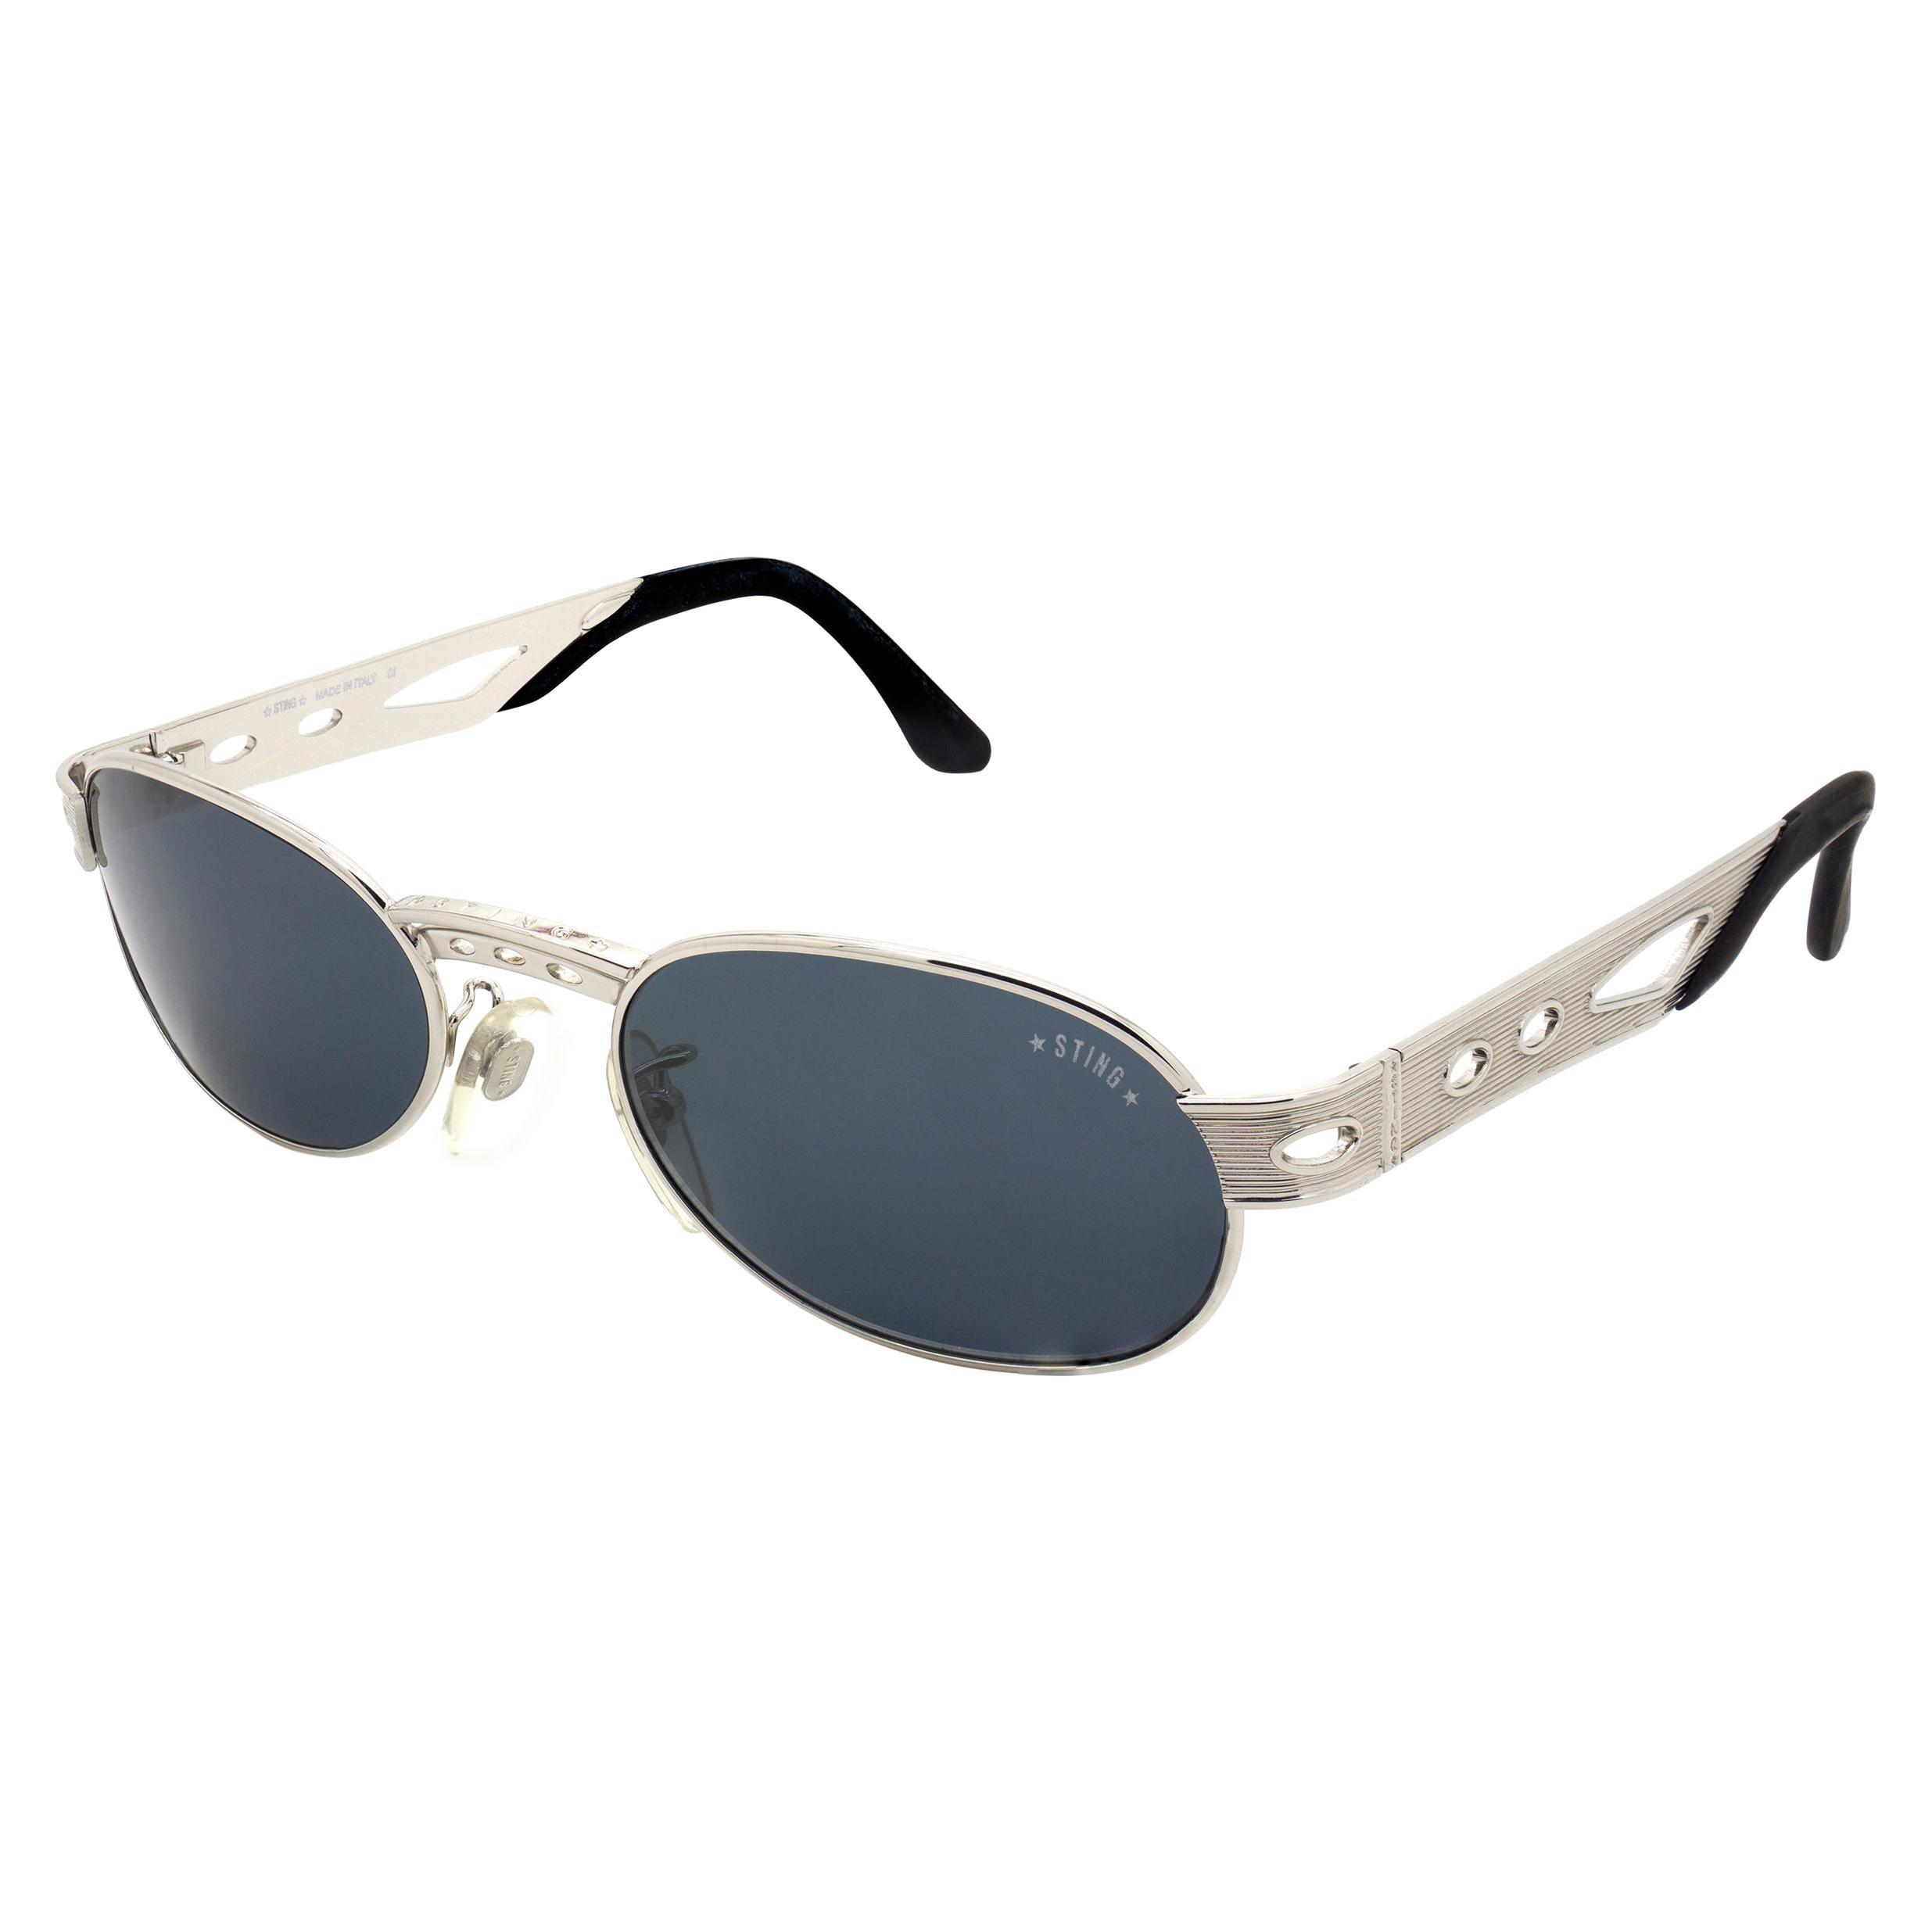 Sting art deco vintage sunglasses